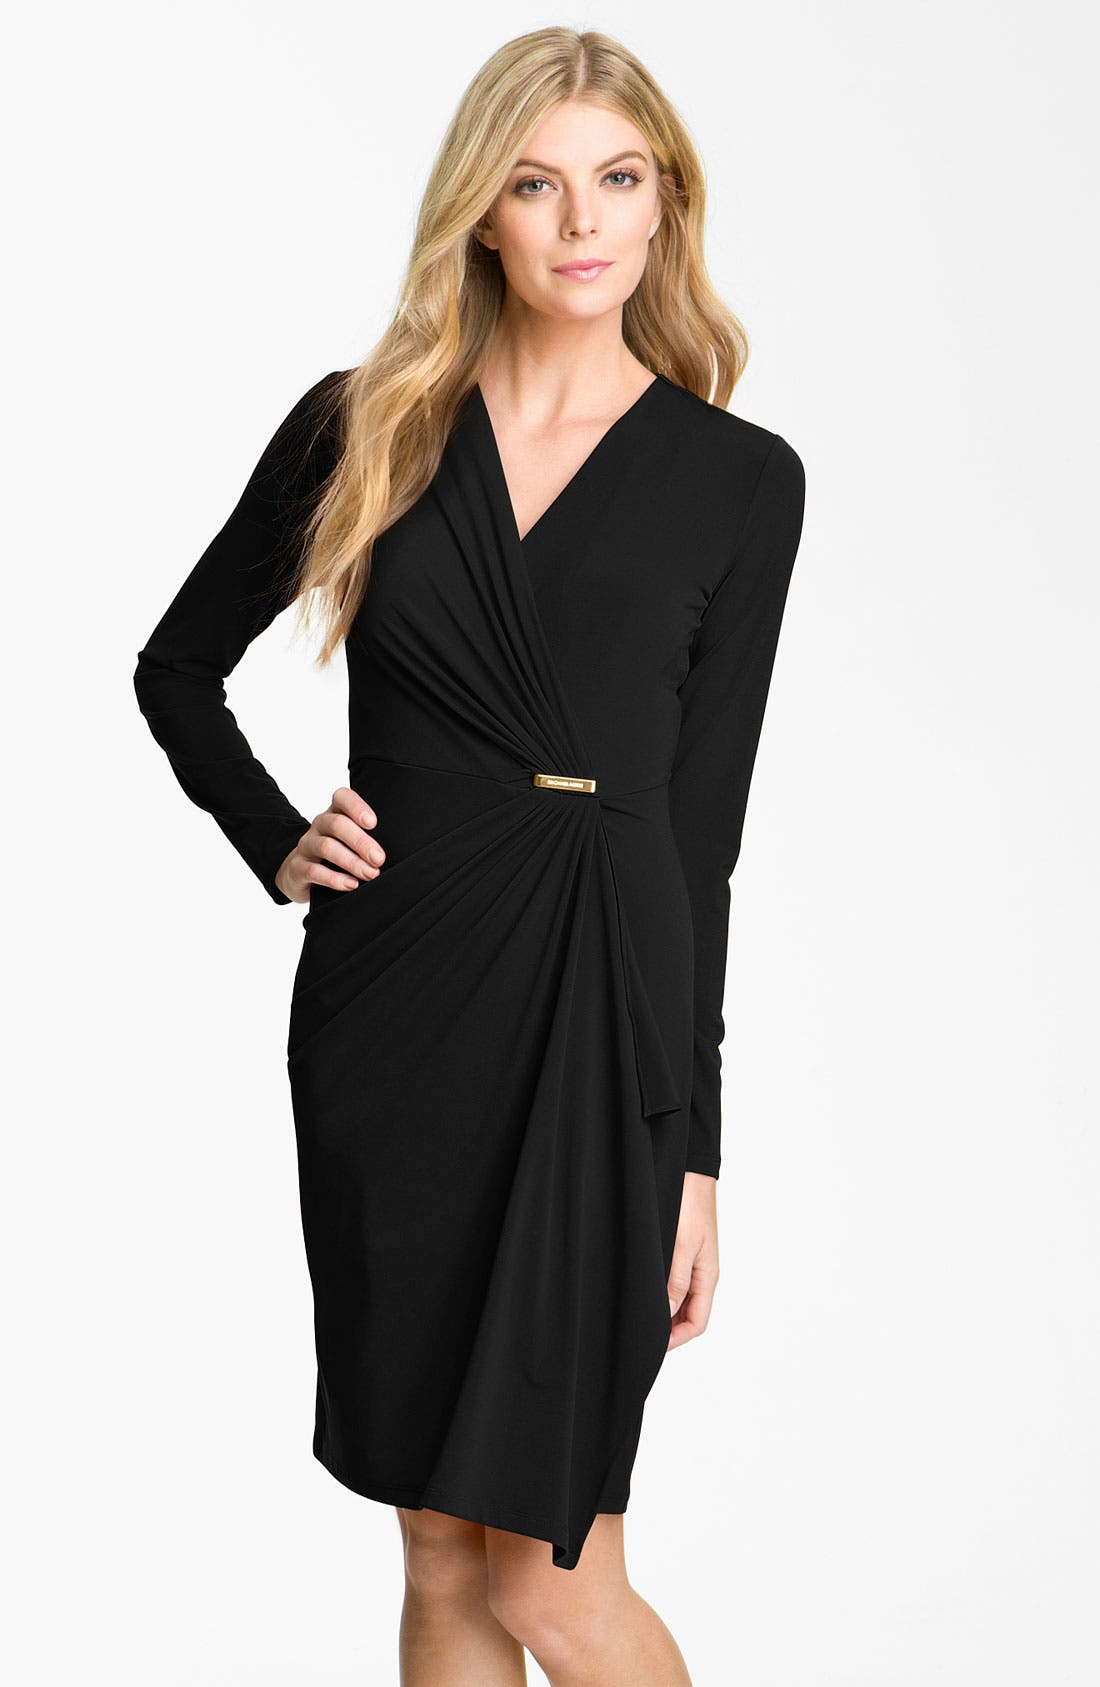 Alternate Image 1 Selected - MICHAEL Michael Kors Faux Wrap Dress (Petite)